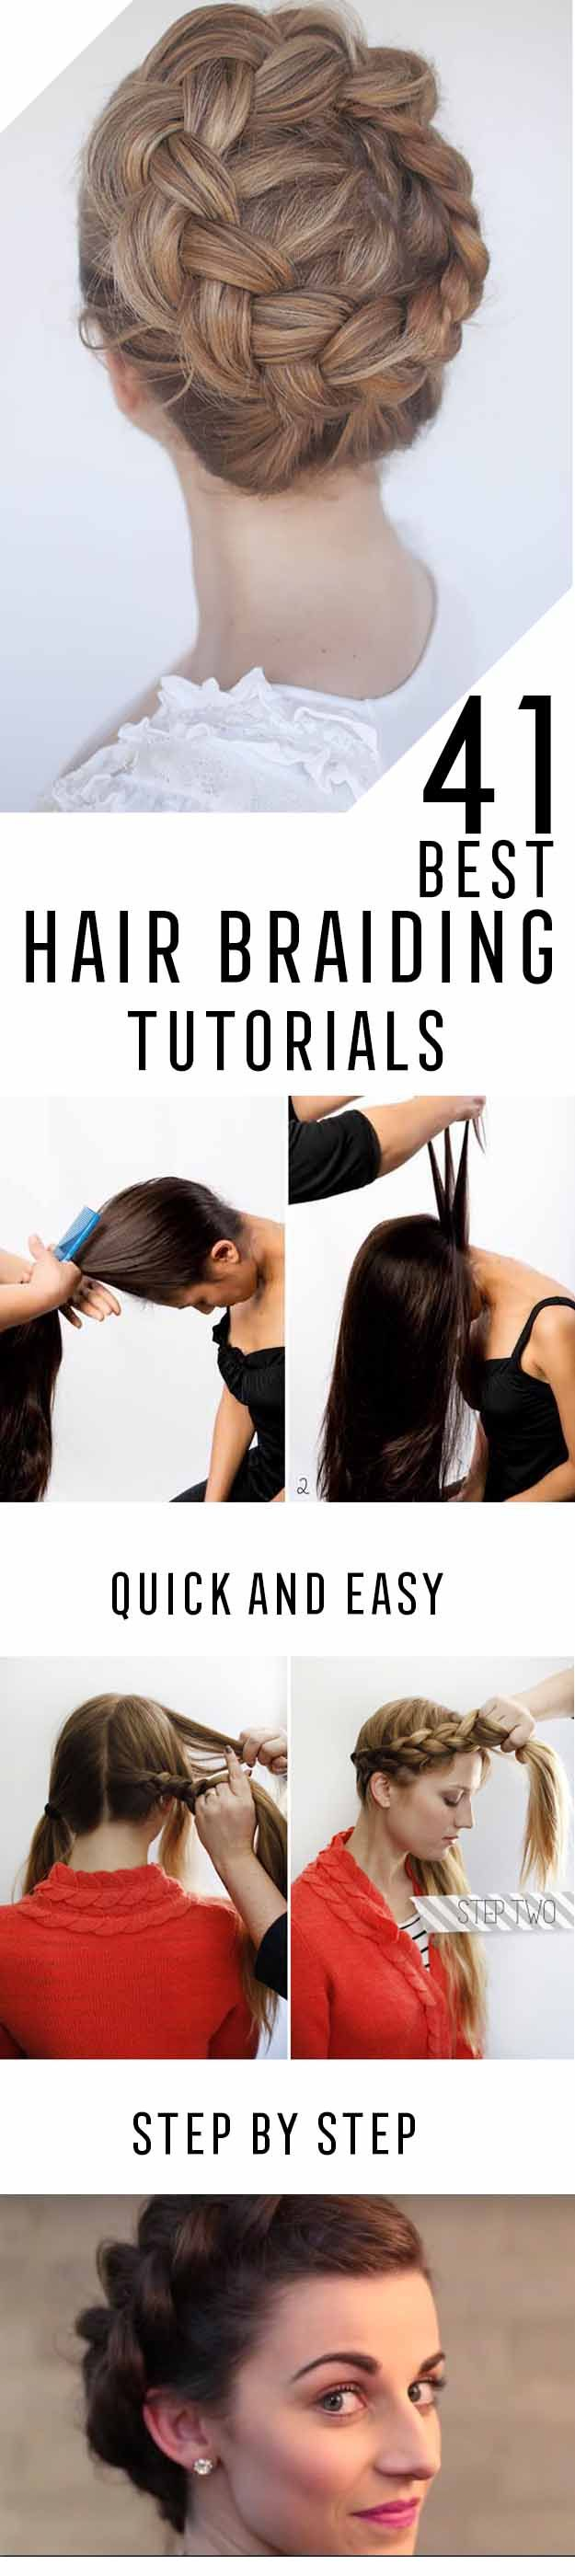 Best Hair Braiding Tutorials - Step By Step Easy Hair Braiding Tutorials For Lon...